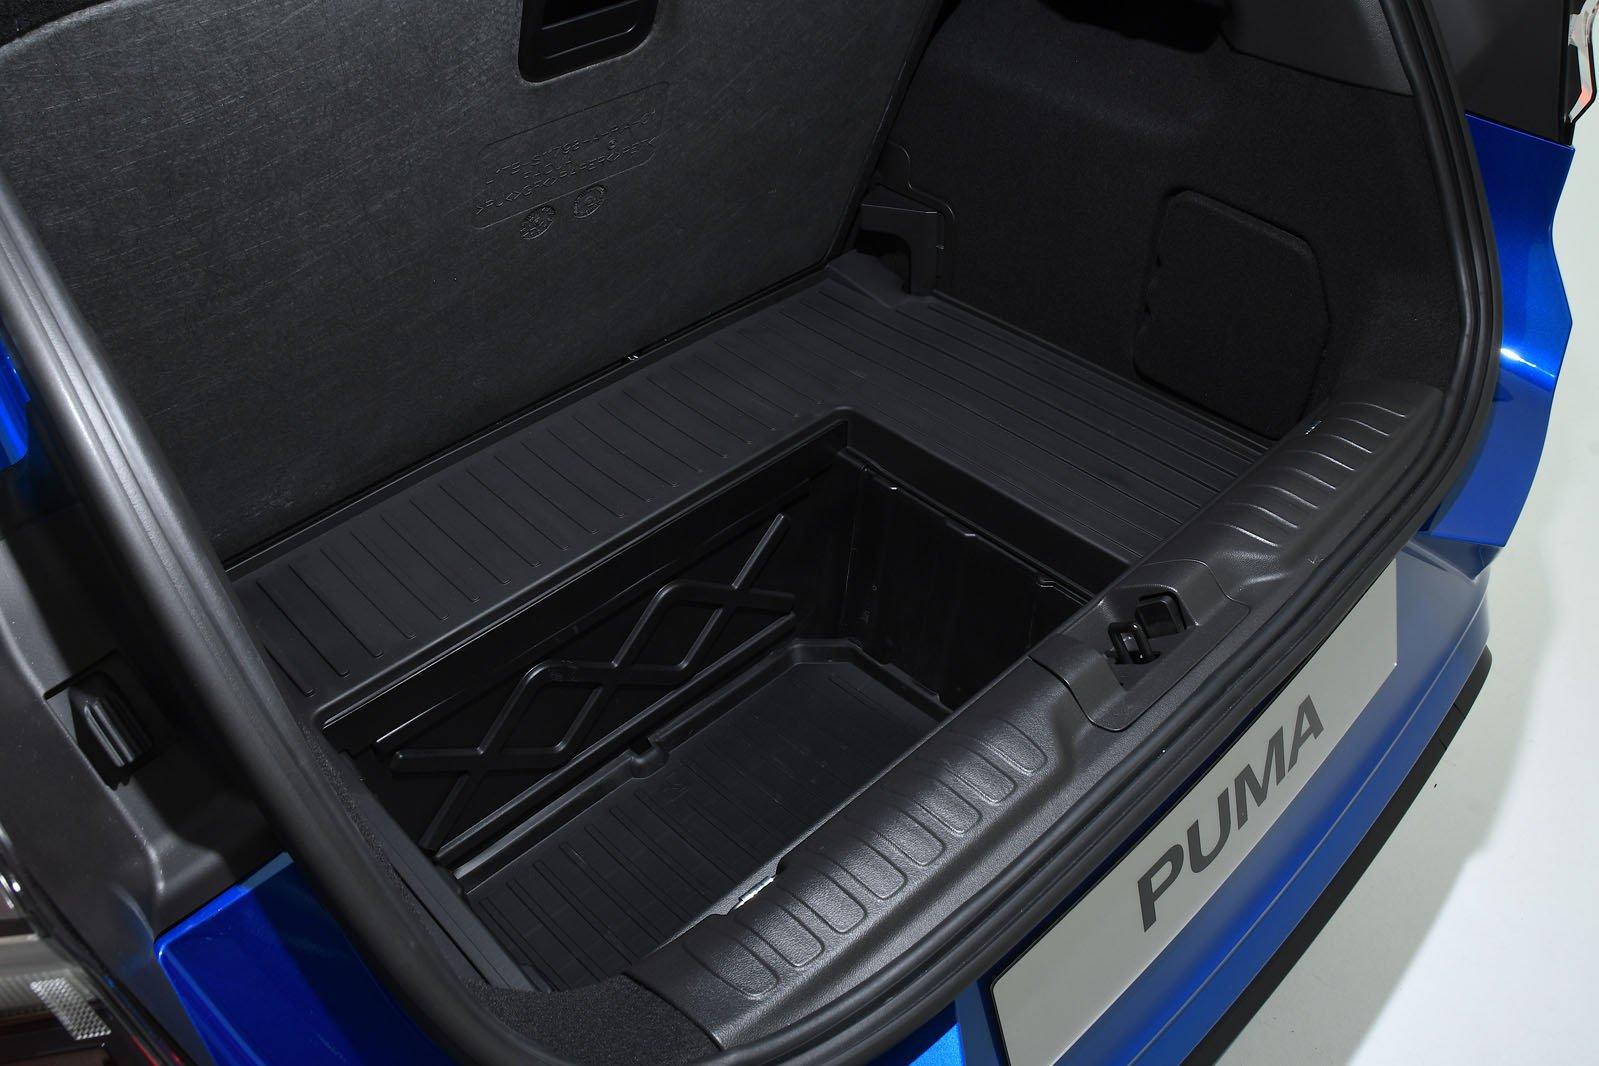 2019 Ford Puma boot